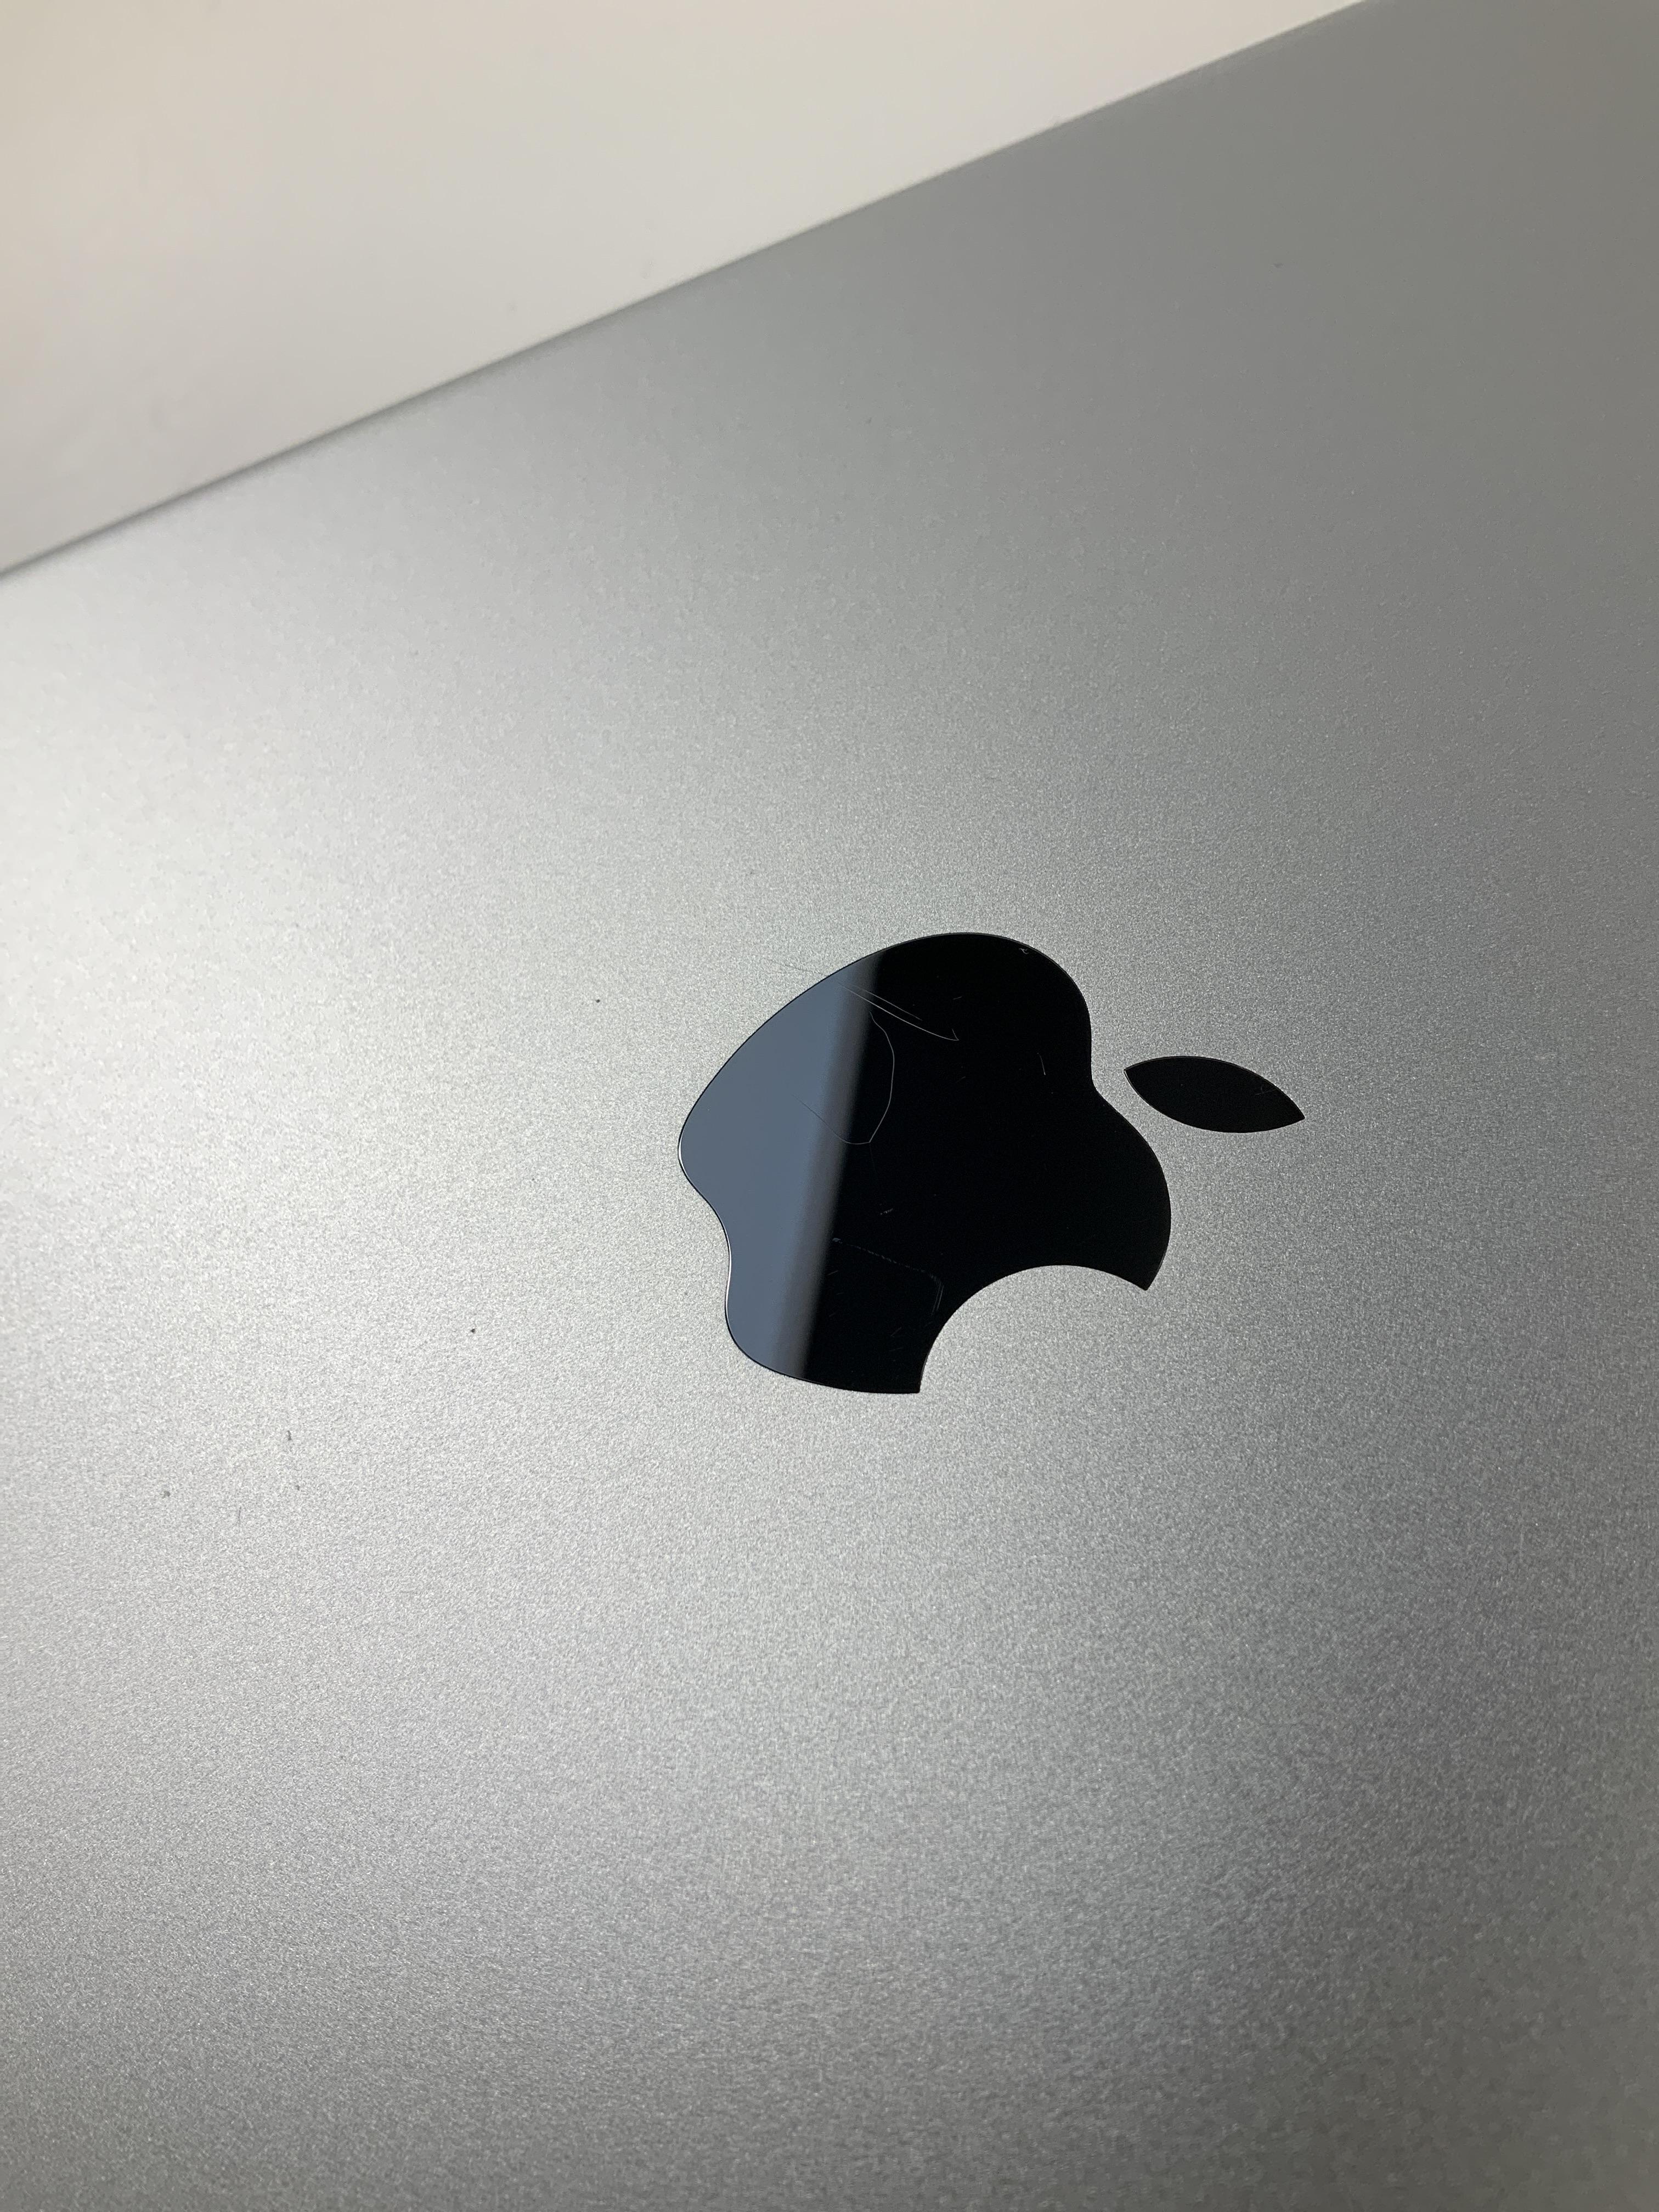 iPad 6 Wi-Fi + Cellular 32GB, 32GB, Silver, immagine 3